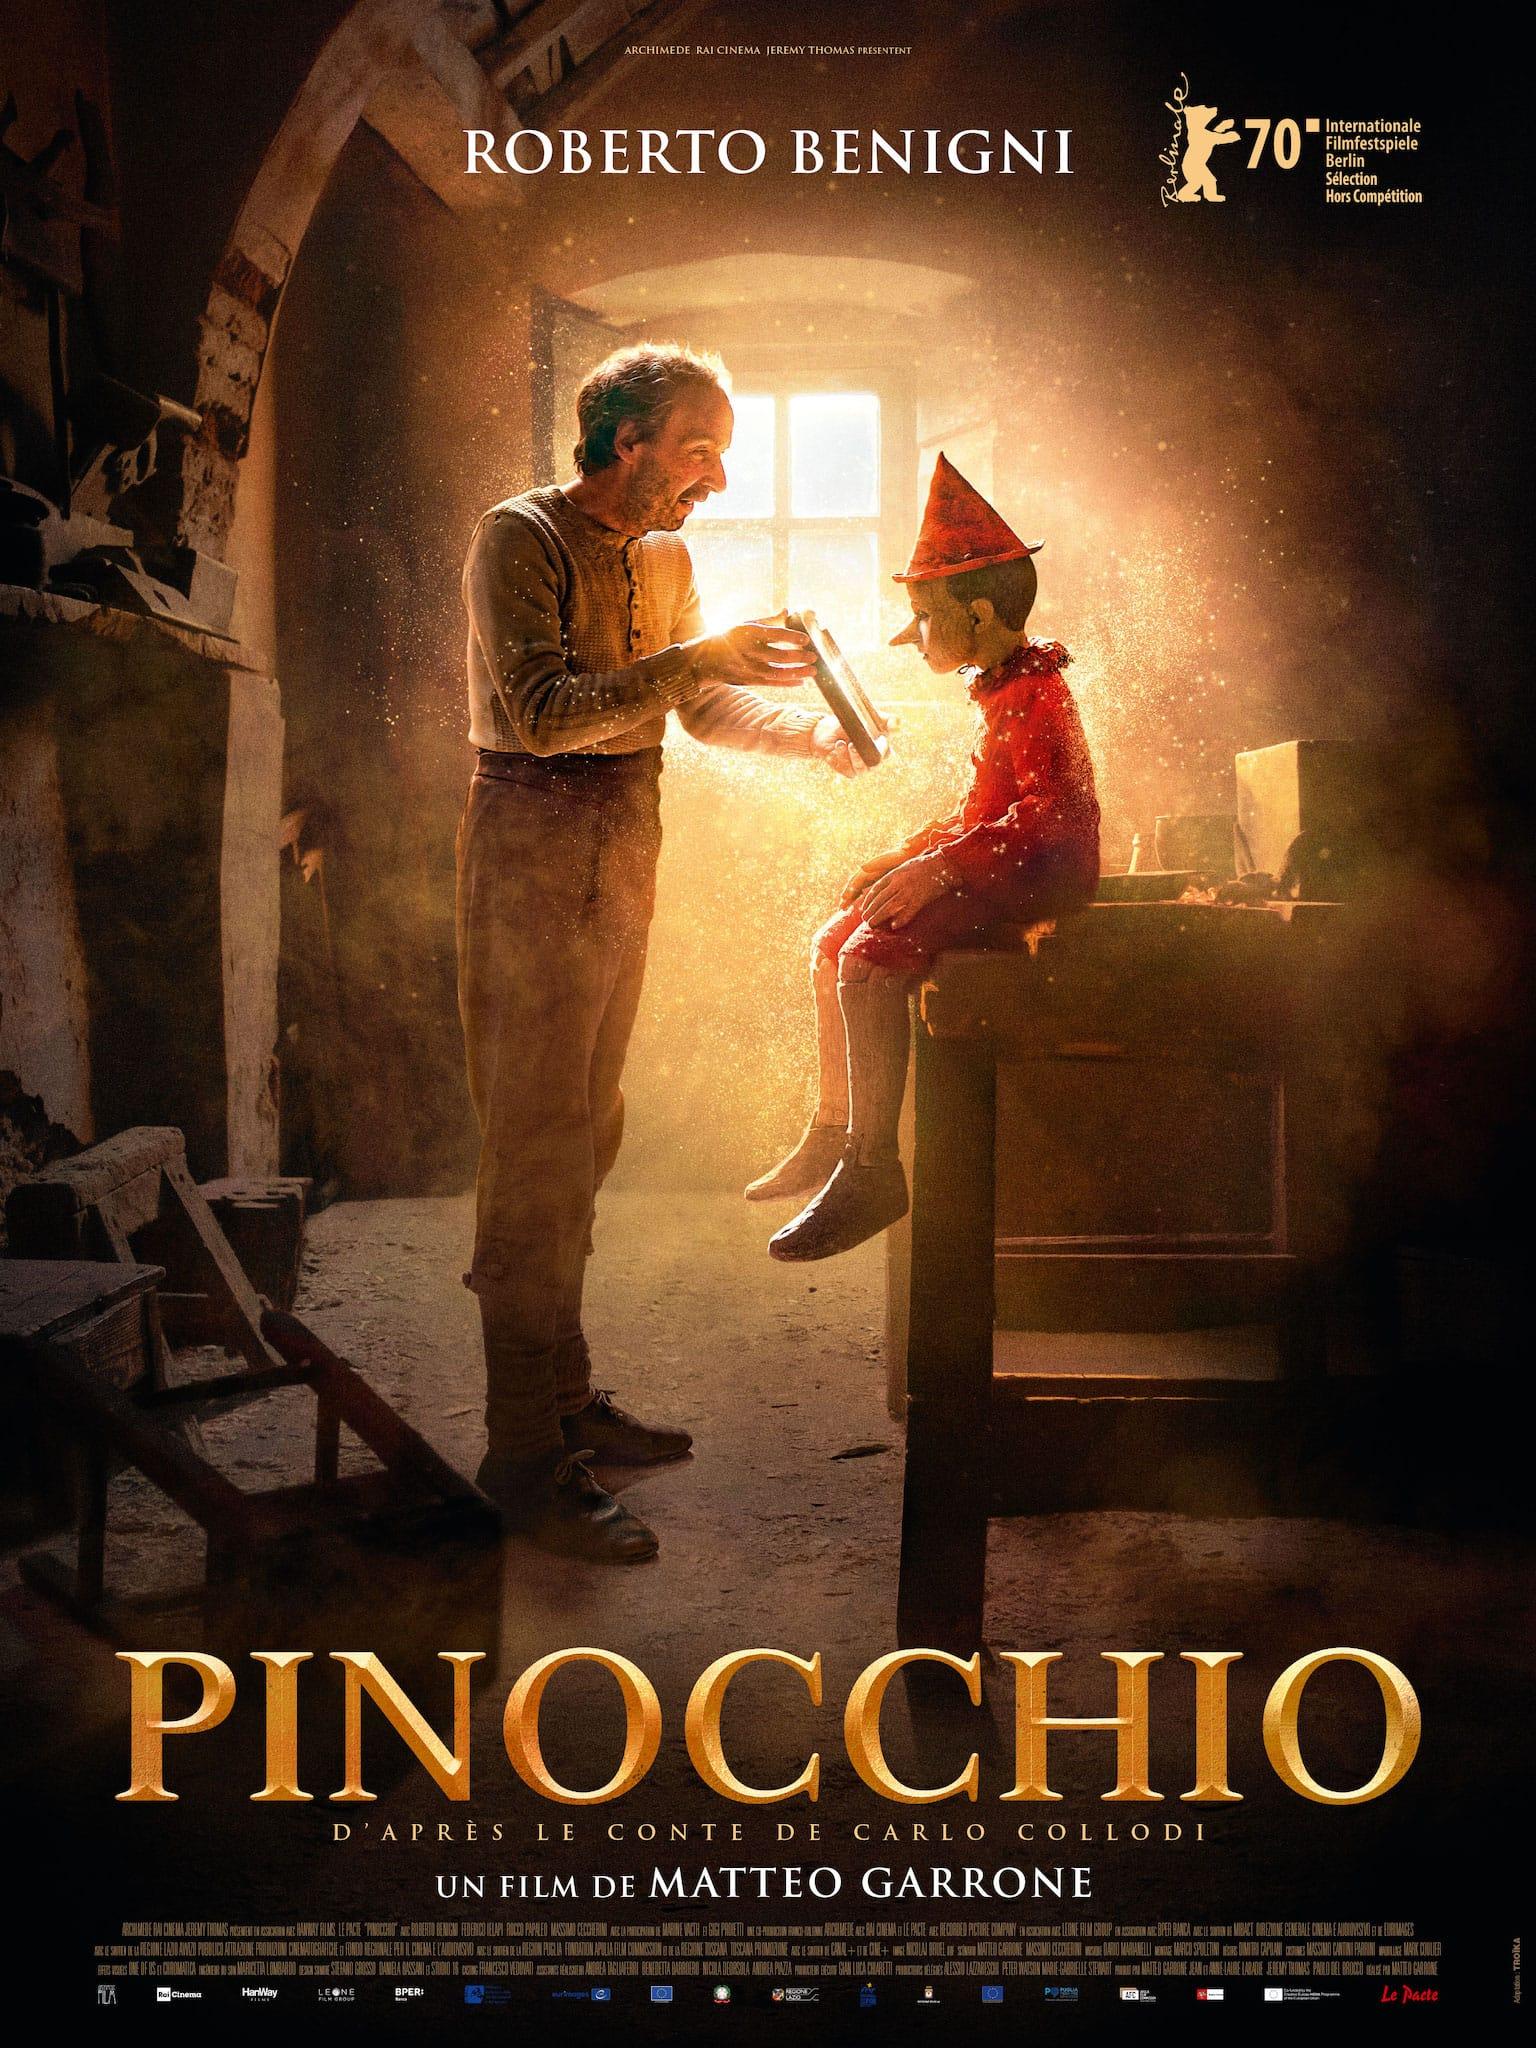 PINOCCHIO de Matteo Garrone film cinéma